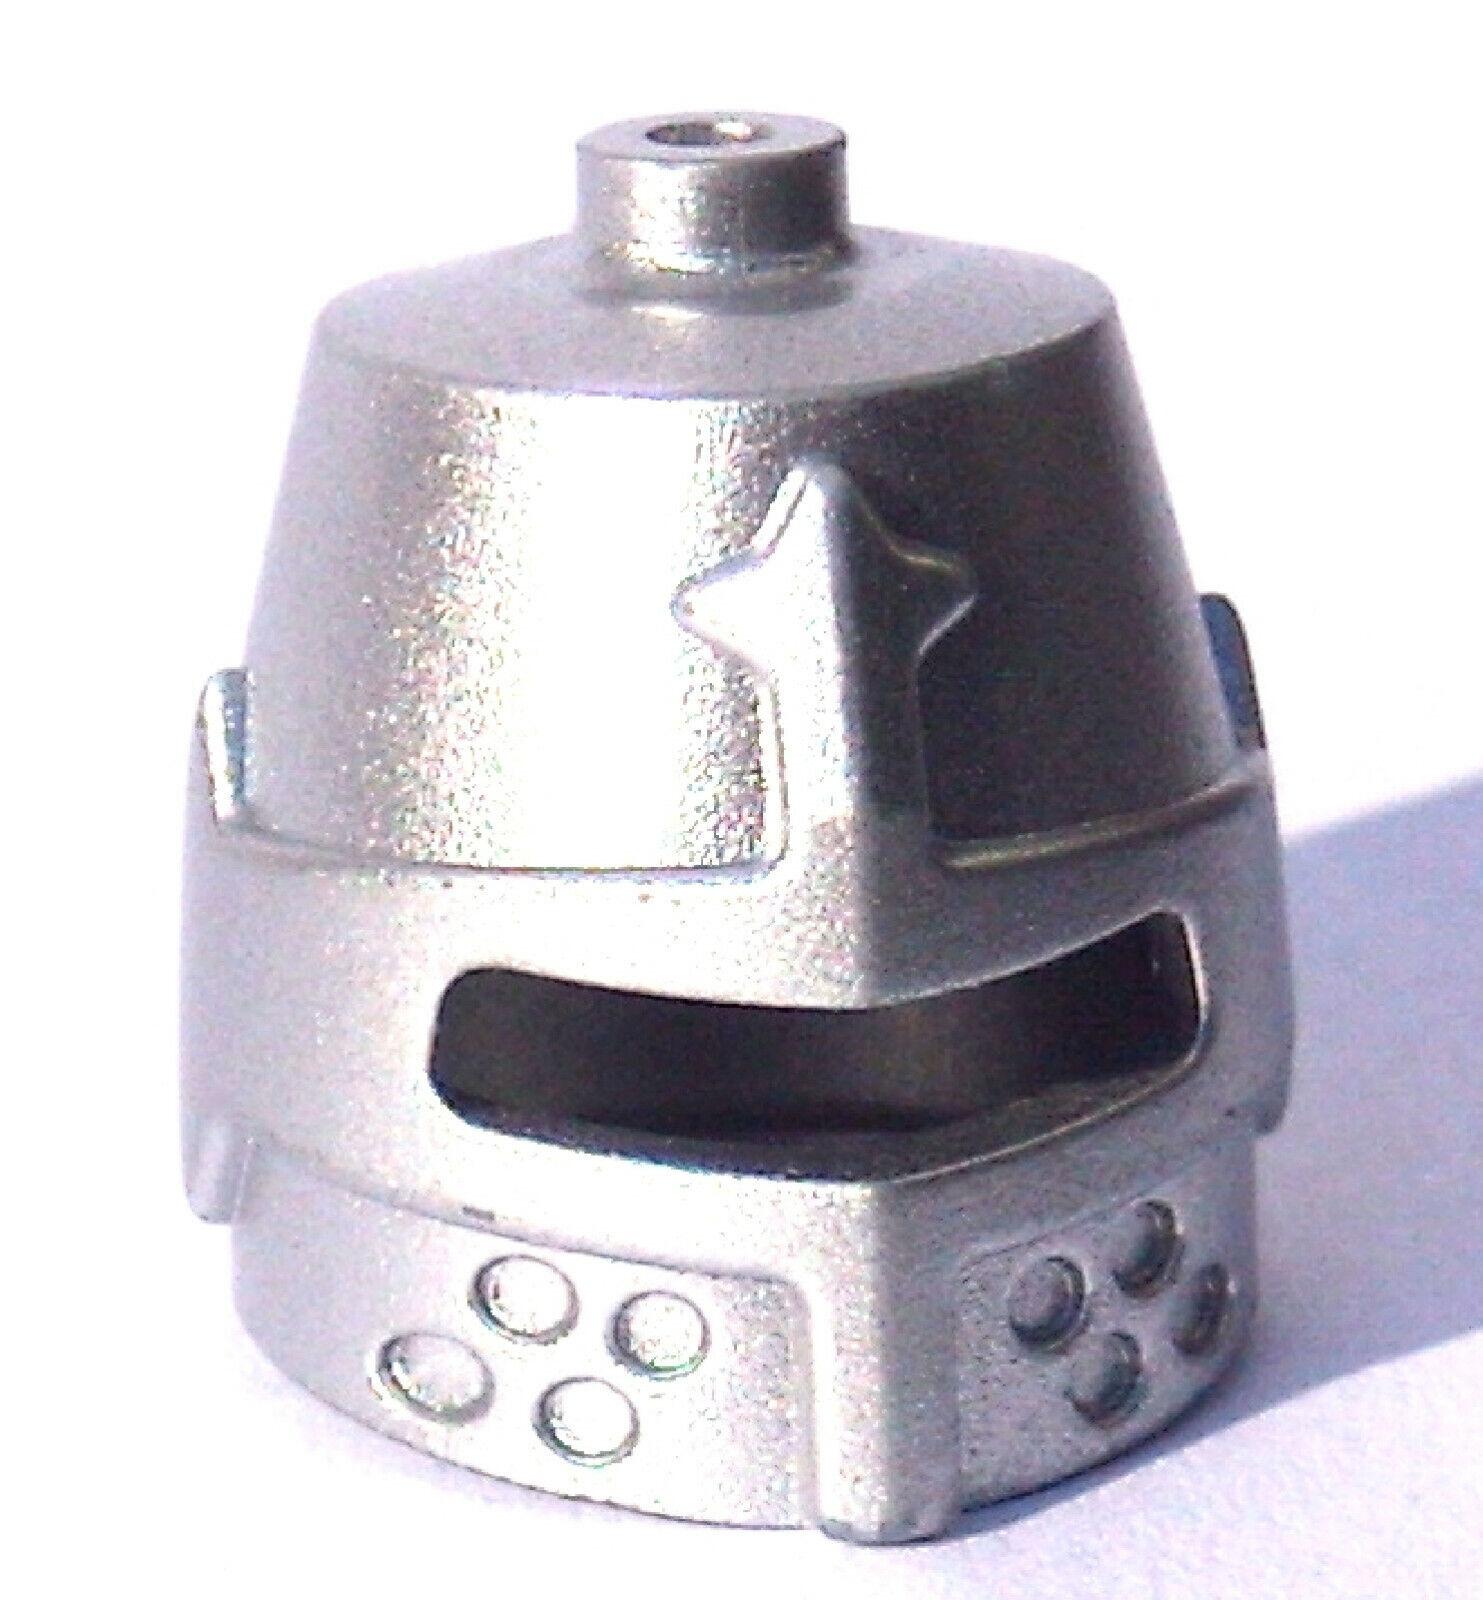 Lego Pferdekampfhelm mit Horn in flat silber Pferd Kopfpanzer Helm Neu 89524